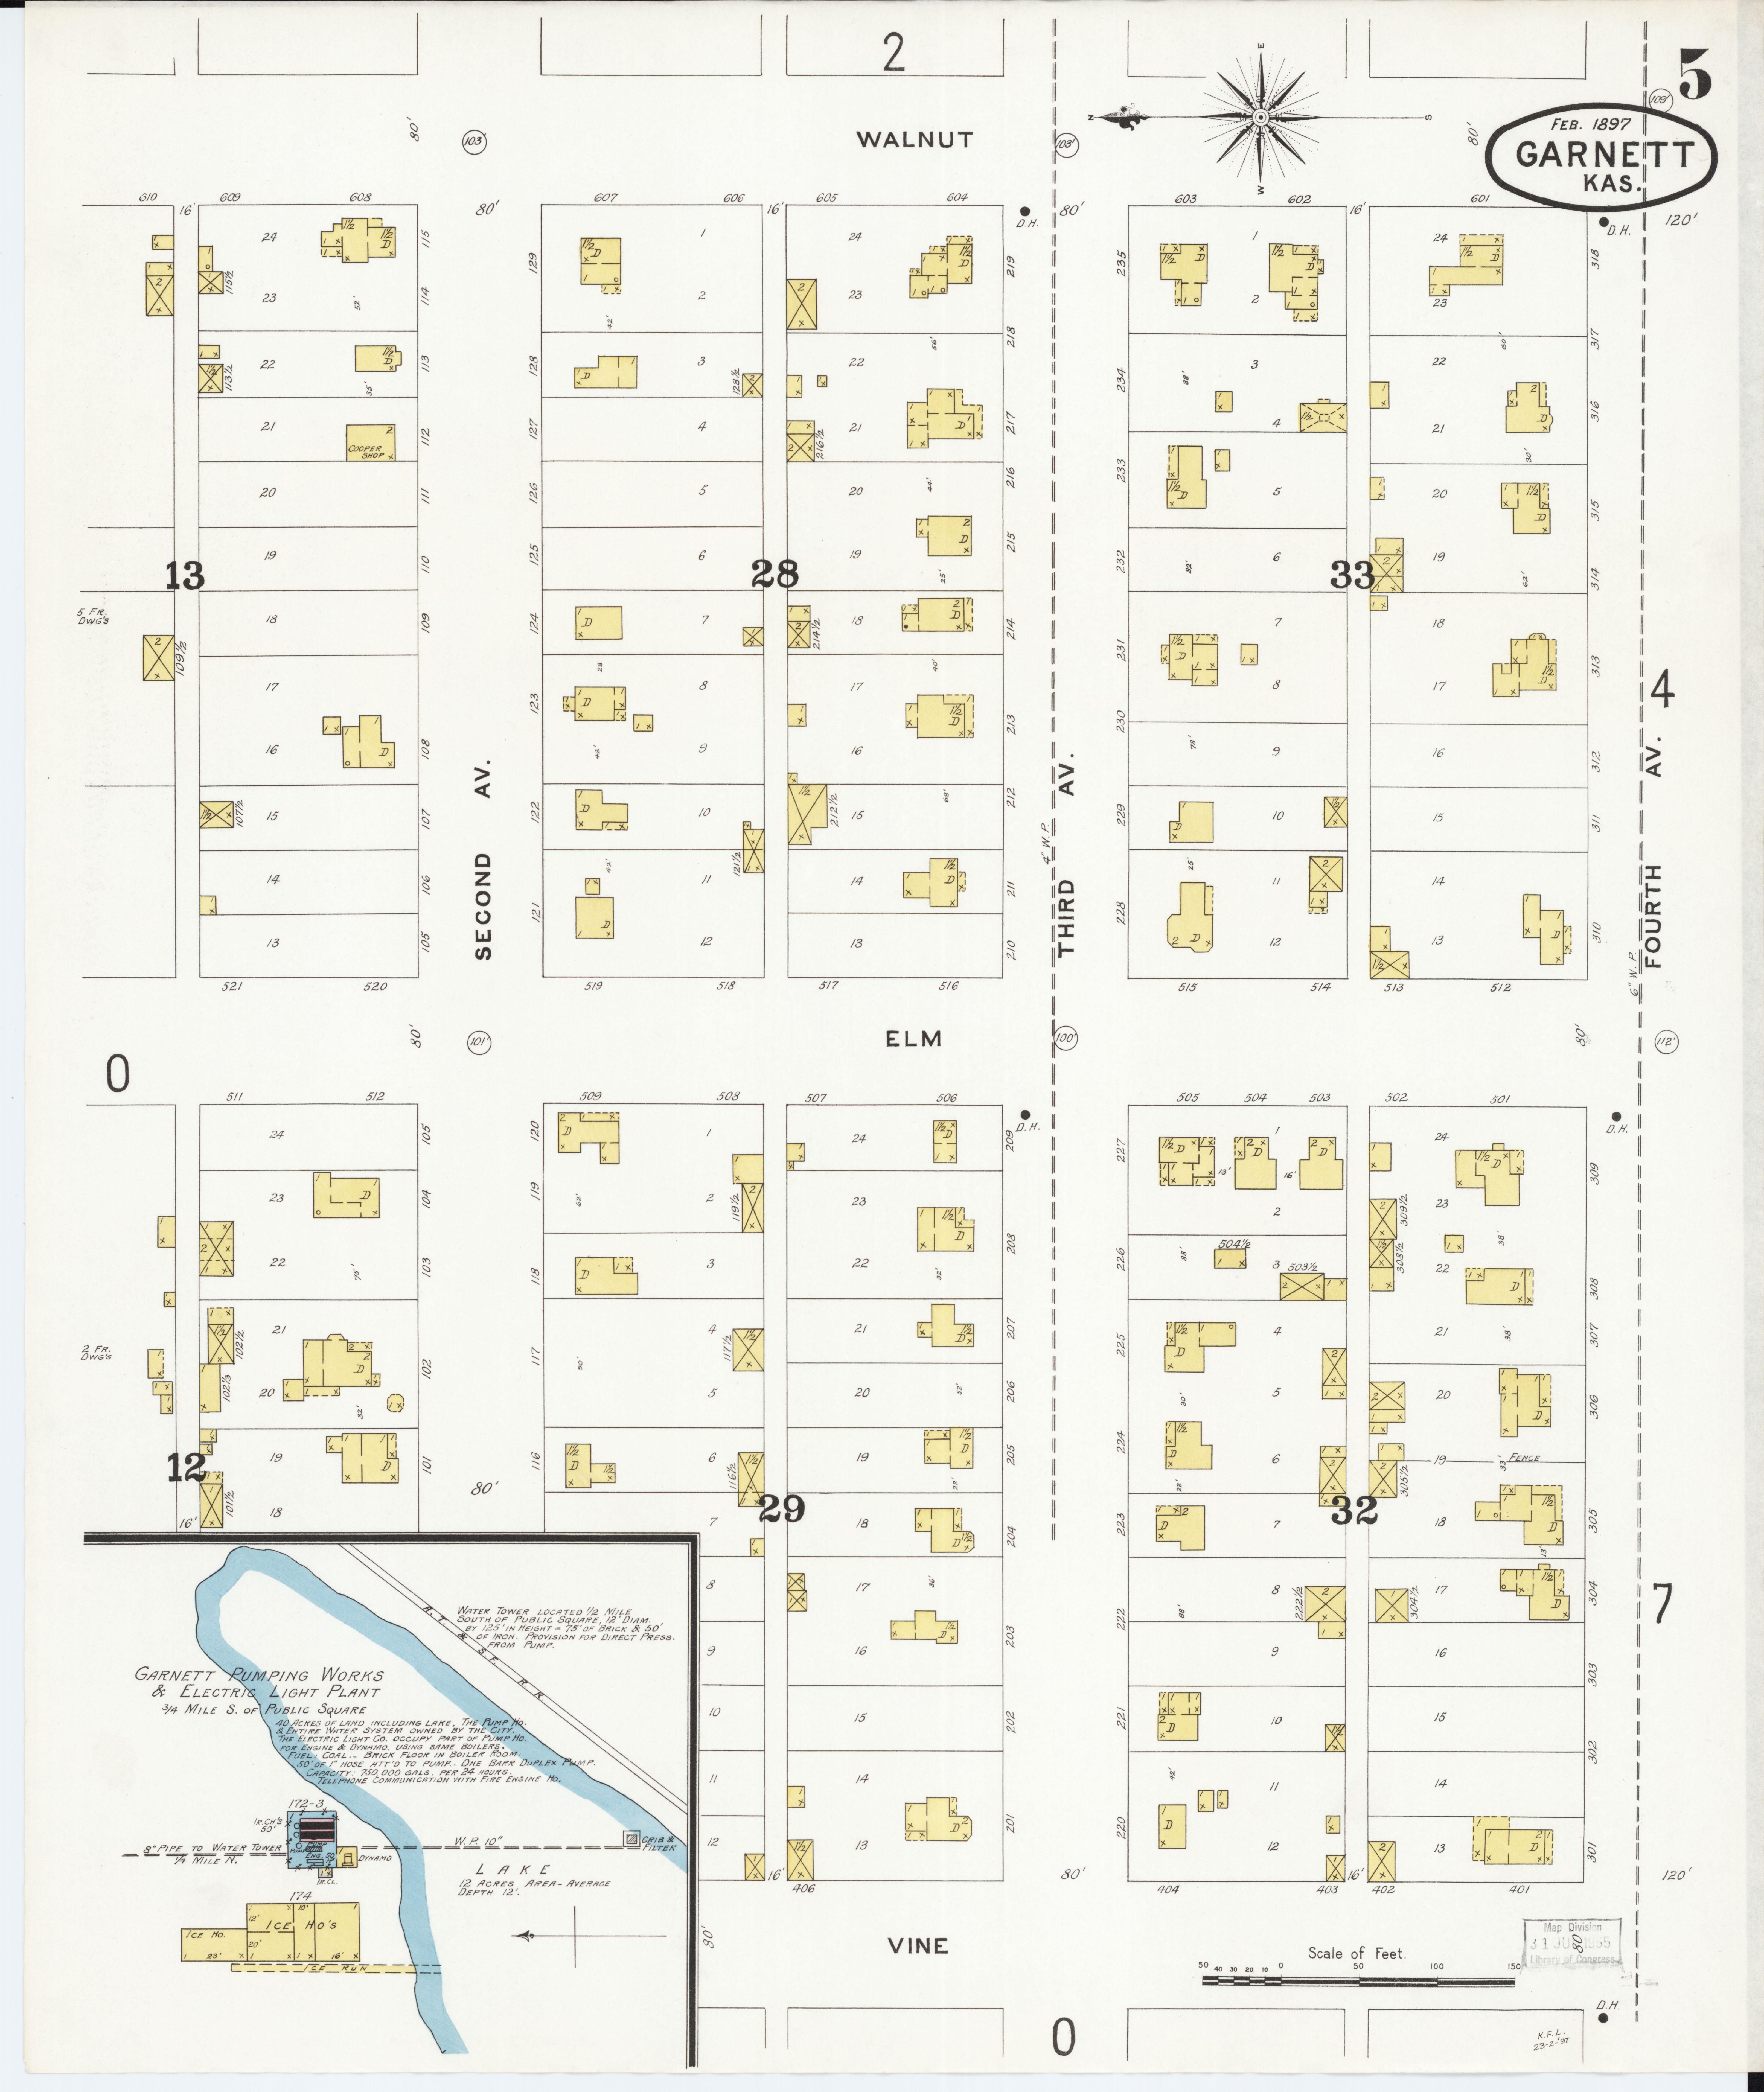 File:Sanborn Fire Insurance Map from Garnett, Anderson ... on olathe kansas map, lawrence kansas map, kansas kansas map, argonia kansas map, pittsburg kansas map, leawood kansas map, liberal kansas map, lecompton kansas map, downs kansas map, cimarron kansas map, kansas city map, lewis kansas map, springfield kansas map, americus kansas map, lyndon kansas map, united states kansas map, ottawa kansas map, burdett kansas map, wellington kansas map, newton kansas map,